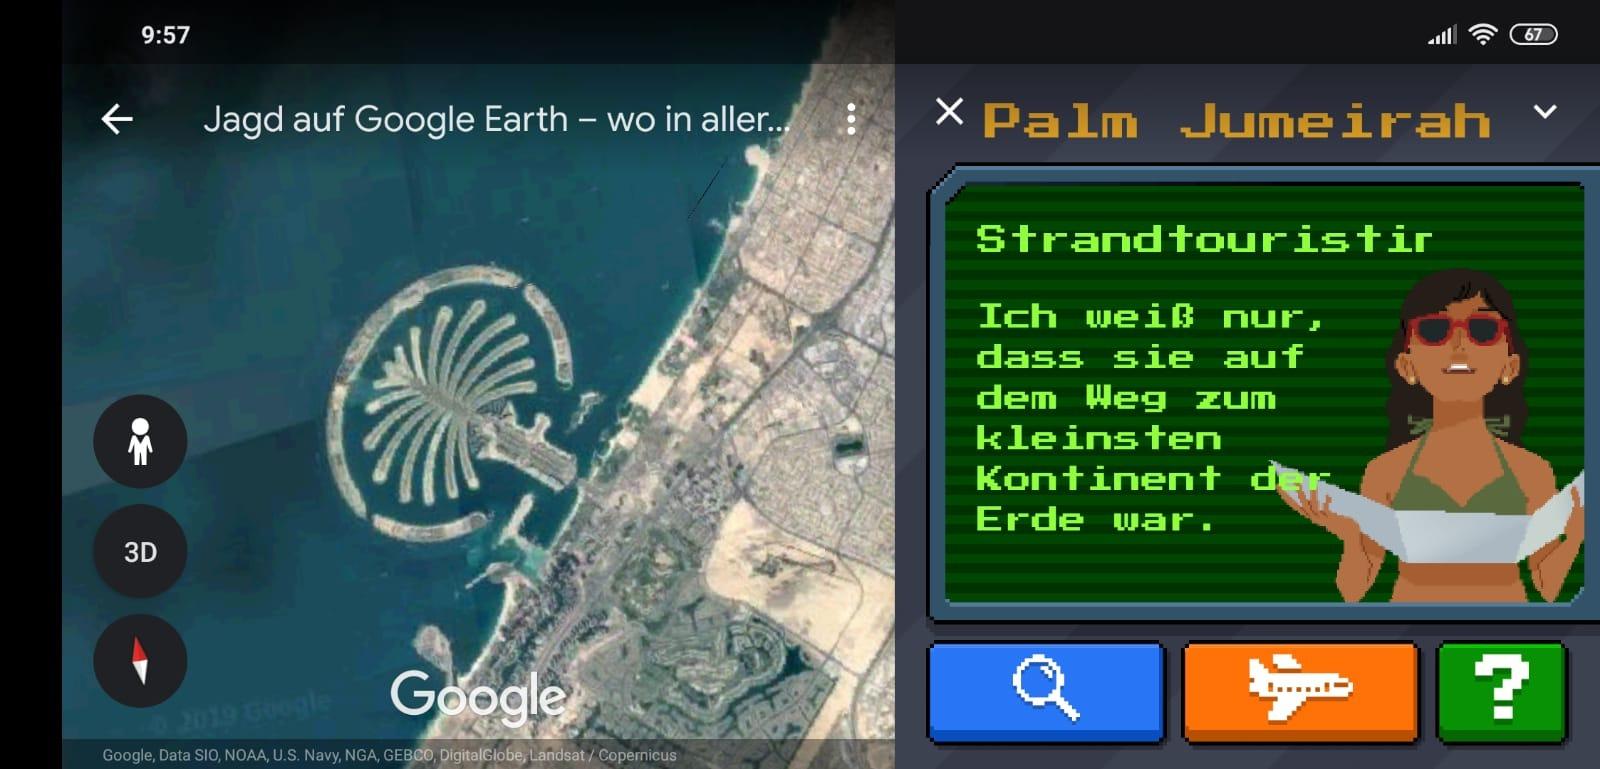 GoogleEasterEggEaster-EggEaster-EggGoogle-MapsGoogle-EarthMapsEarthAppSpielCarmen-Sand-3.png